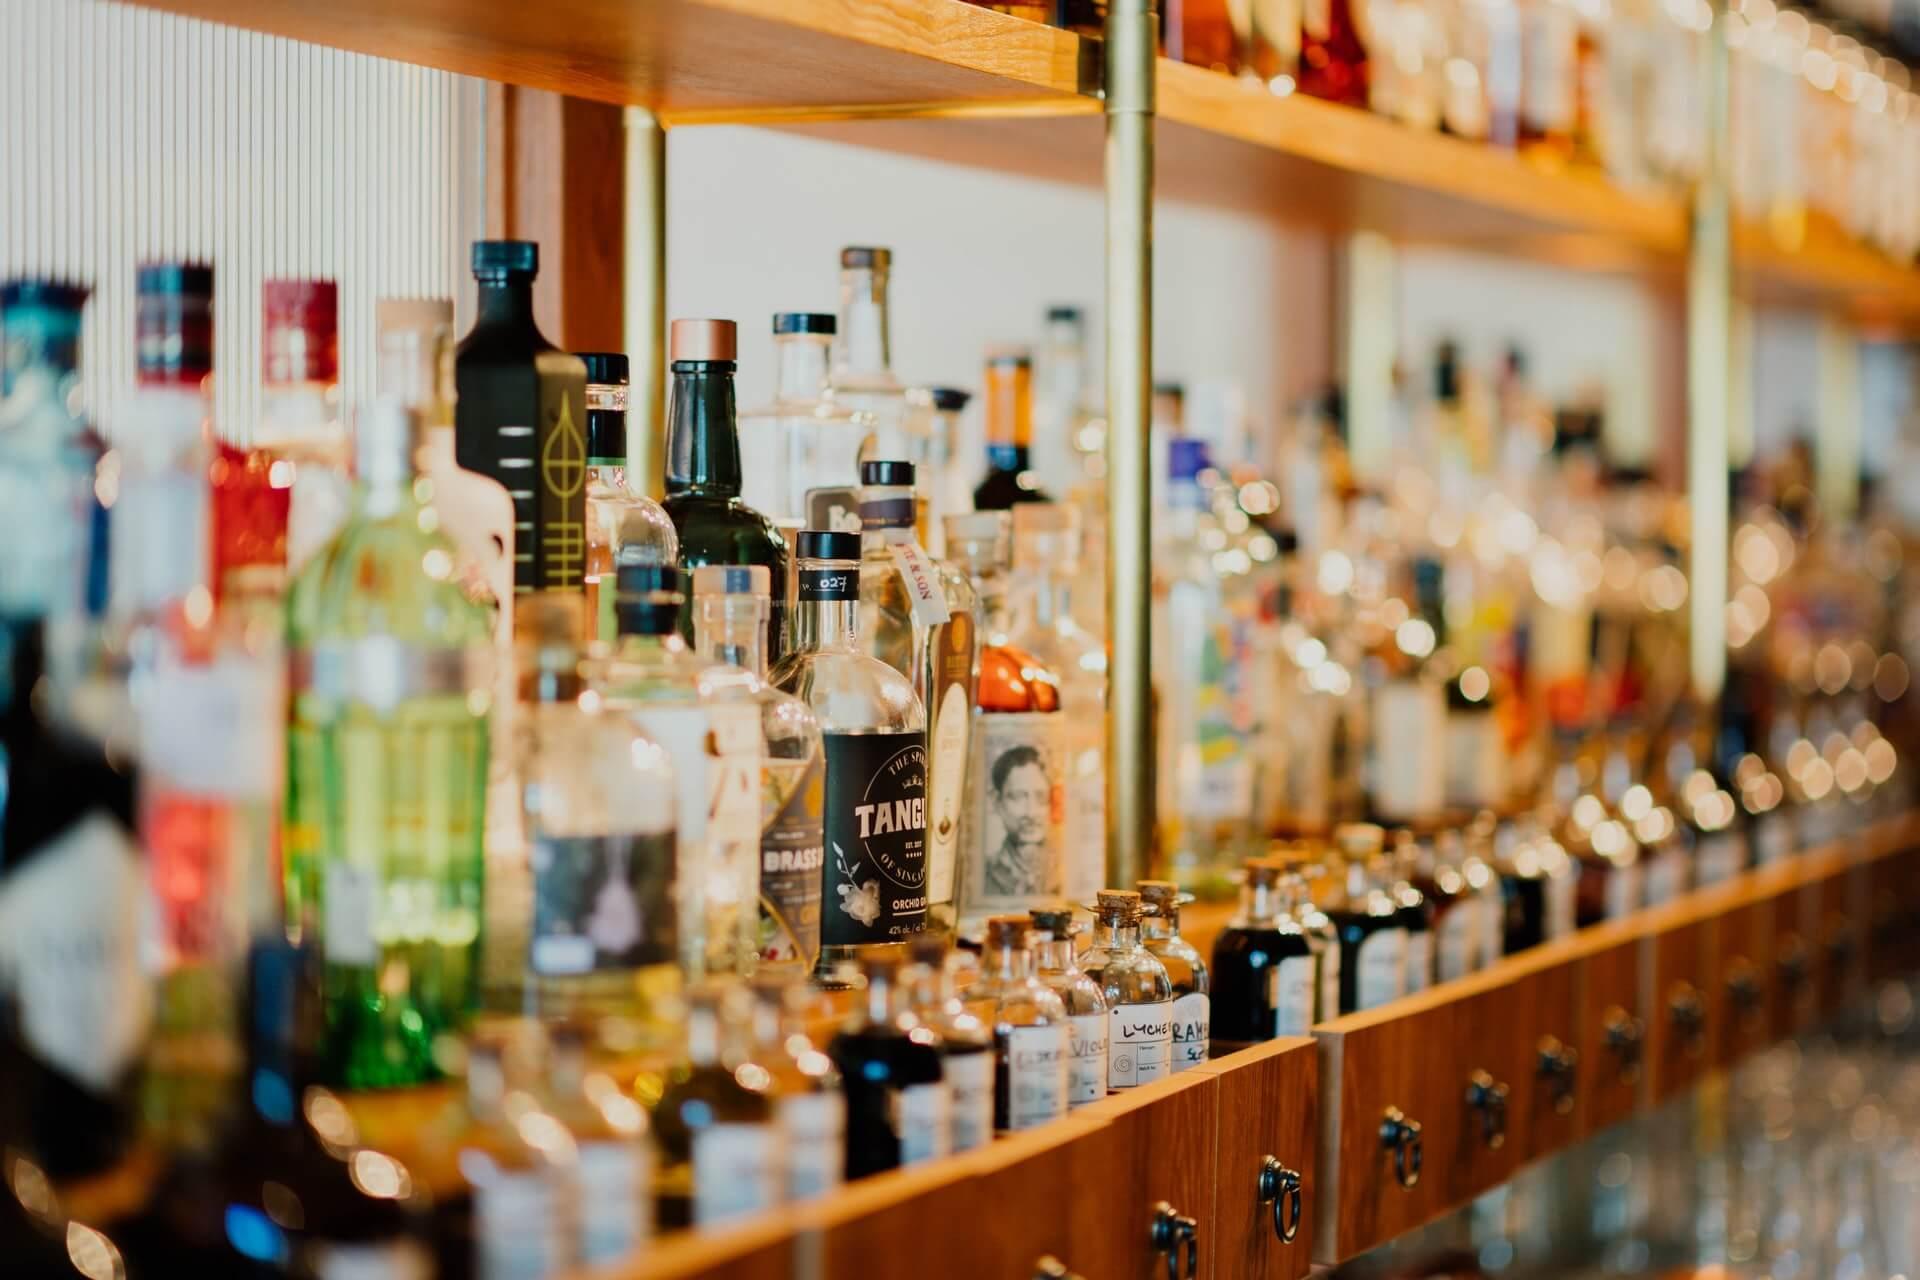 Bottles of alcohol in a liquor shelf